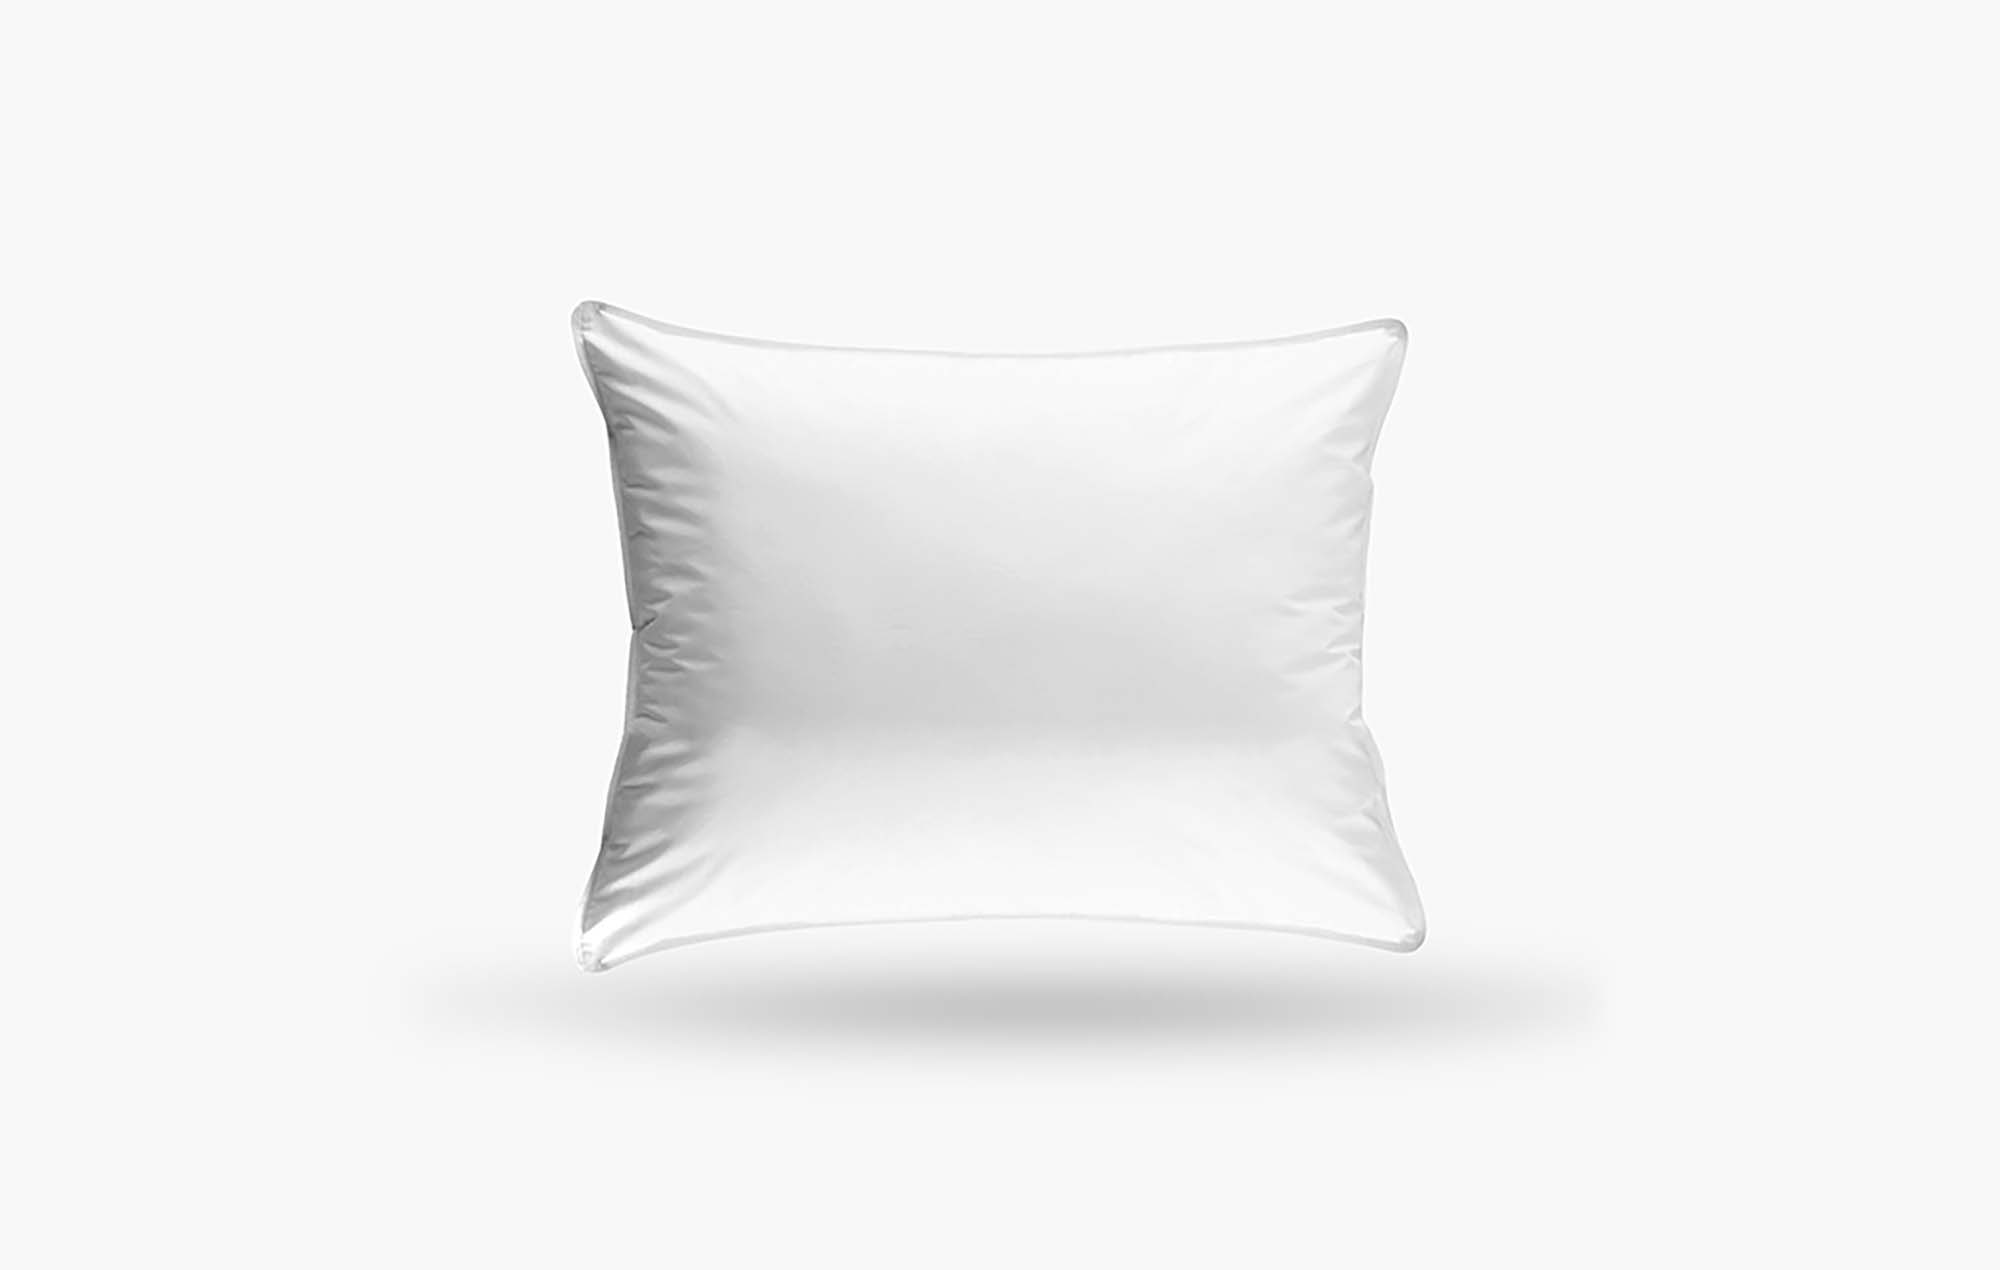 Rectangle Pillow Mockup 3